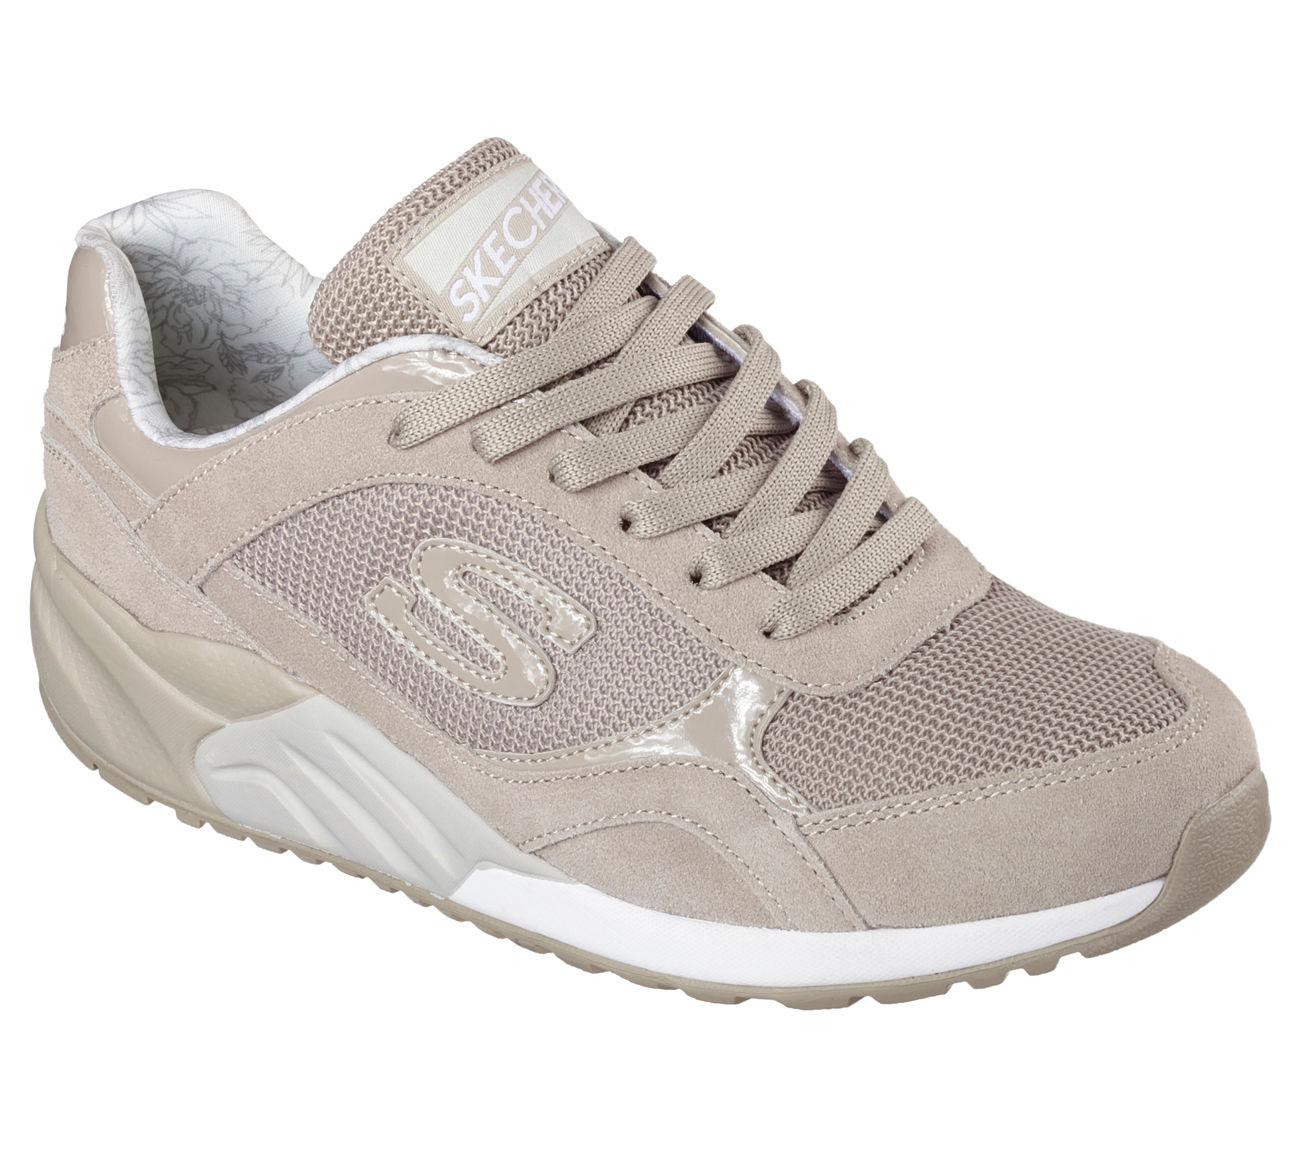 Skechers 611 TPE Women's OG 95 - GREAT HEIGHTS Sneaker Size 8 Taupe NWOT